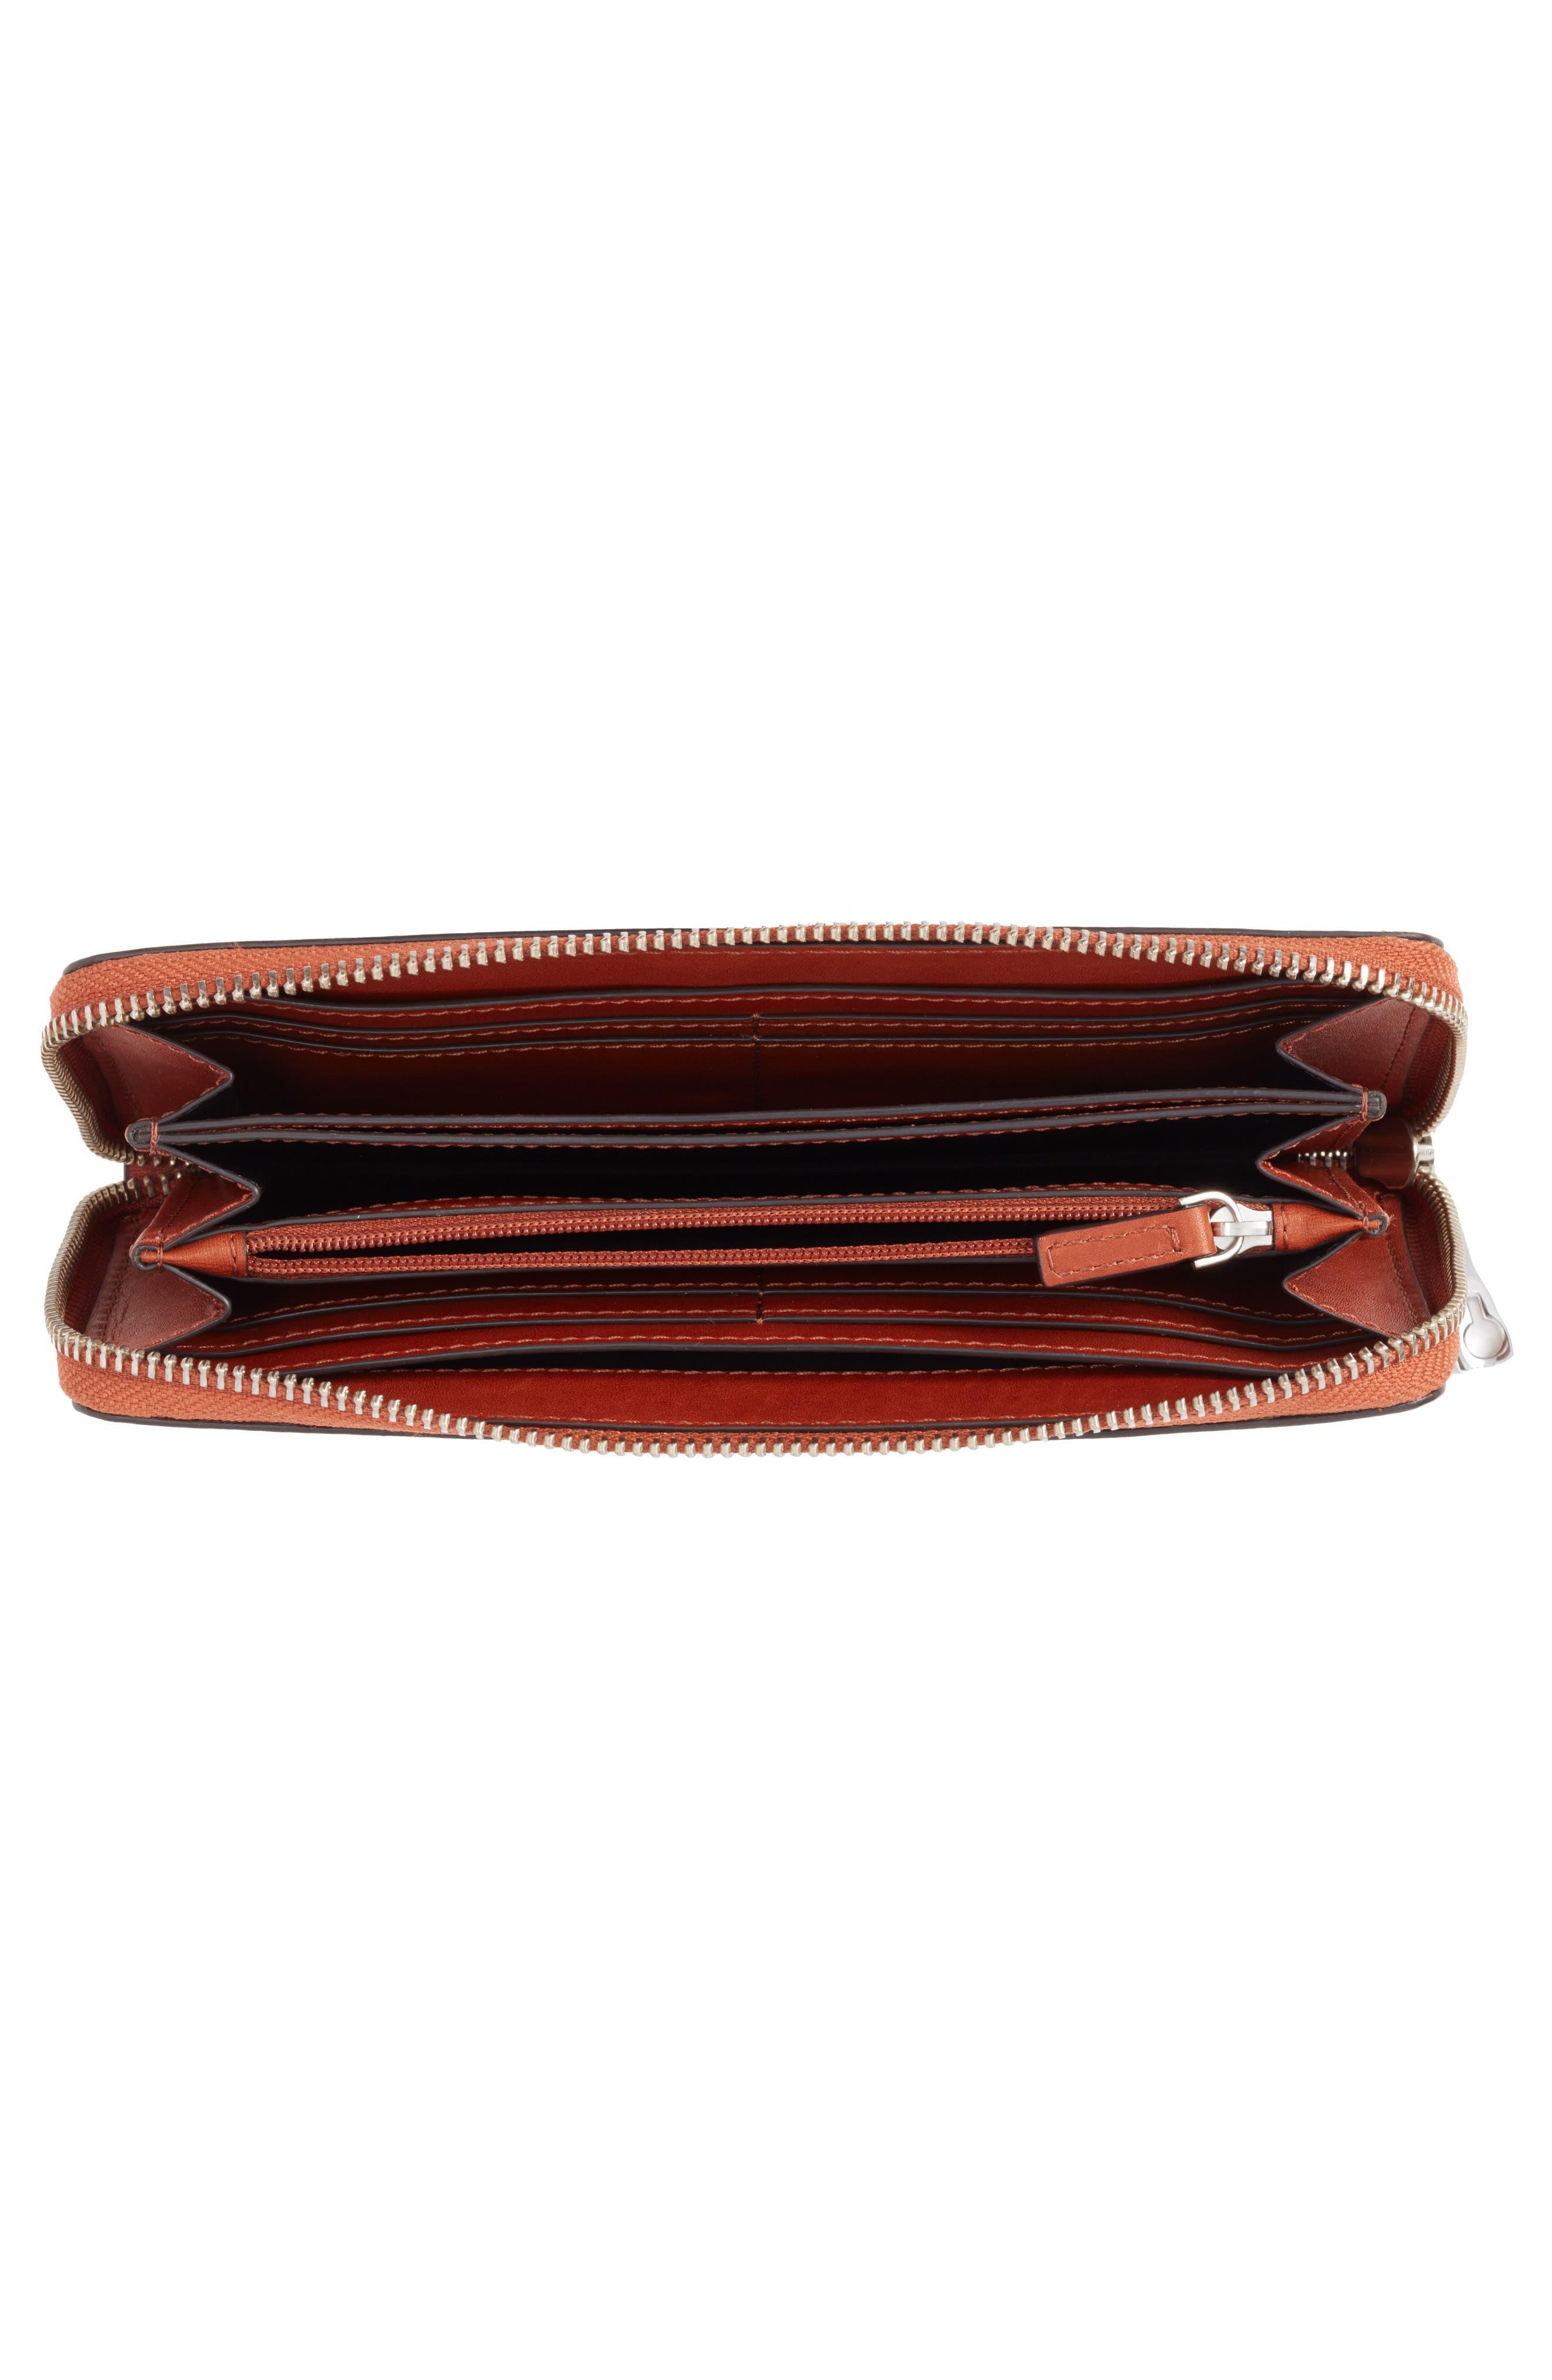 Continental Zip Wallet,                             Alternate thumbnail 4, color,